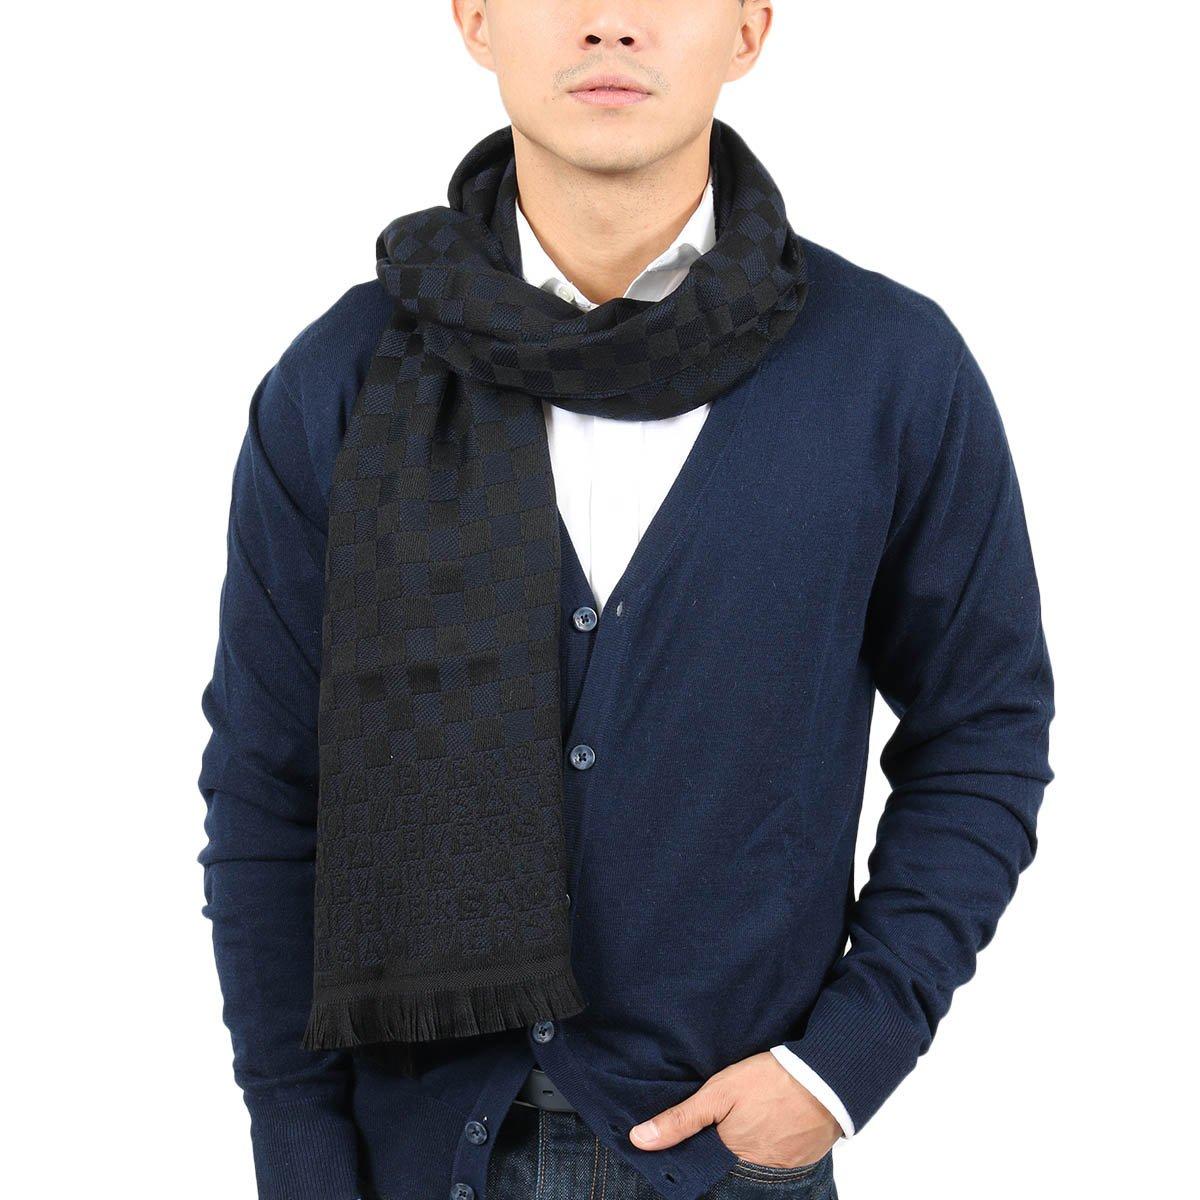 Versace IT00628 MARINO Navy Blue 100% Wool Mens Scarf